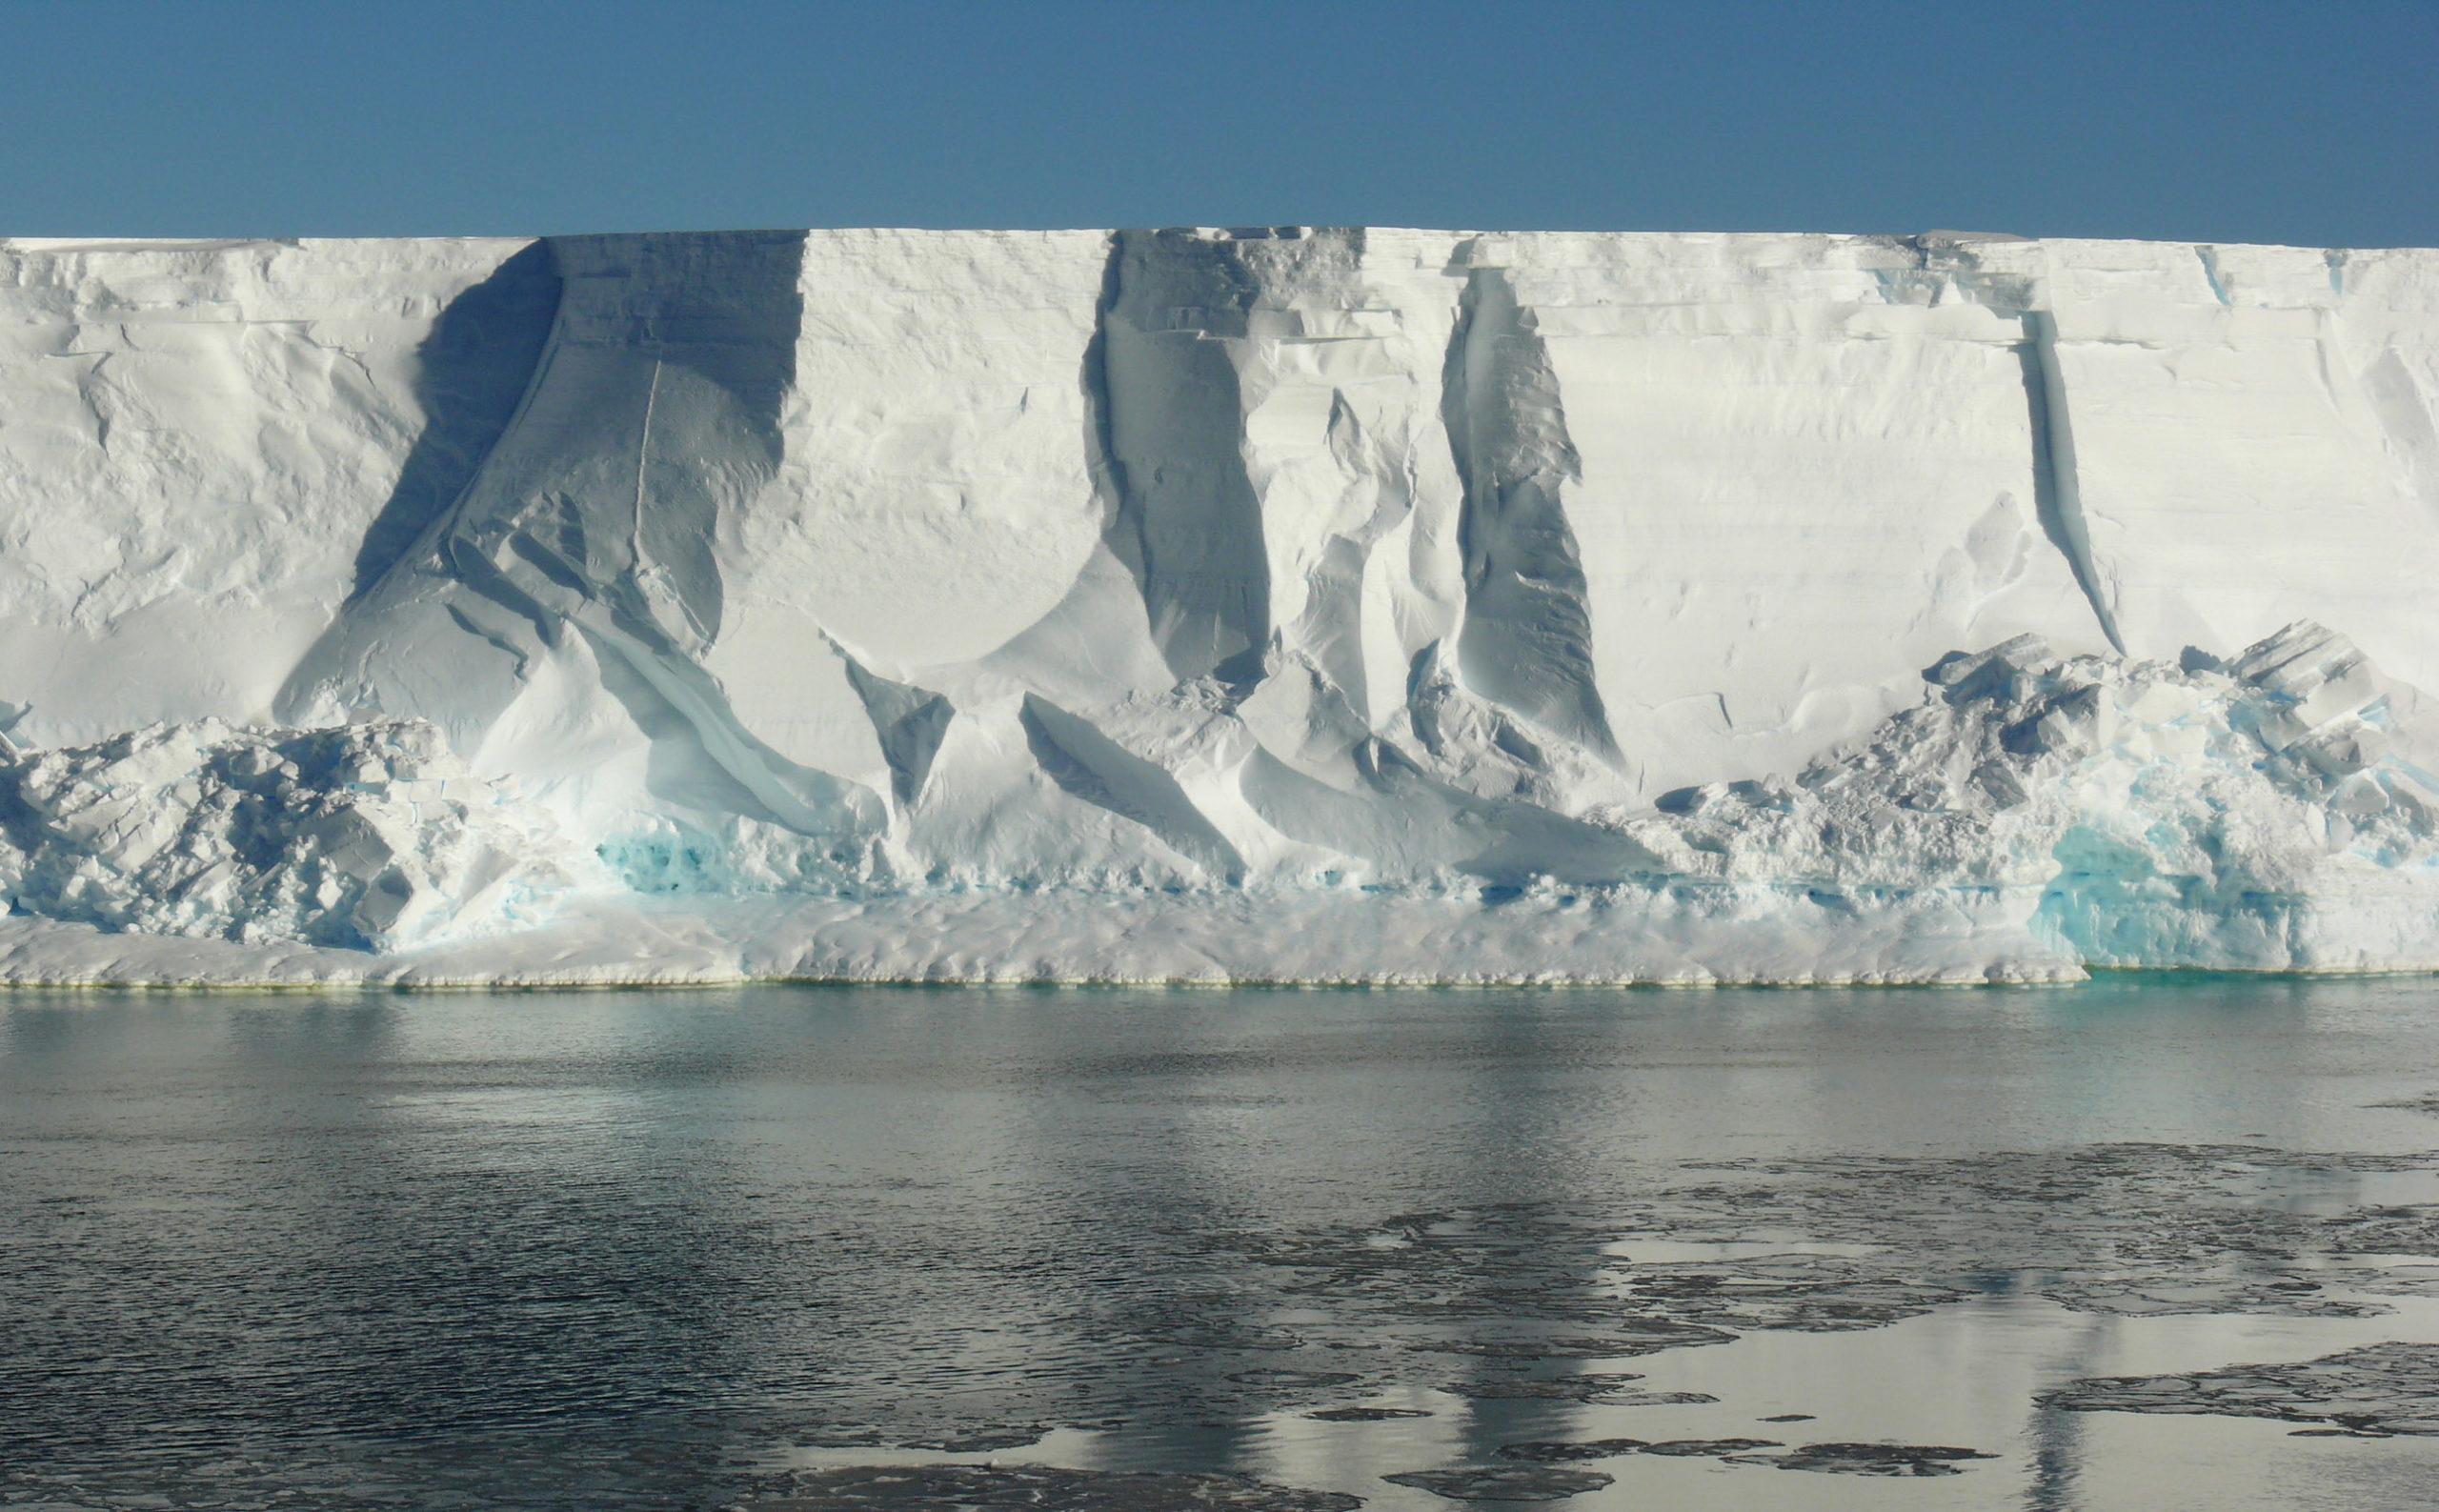 australische Antarktis (Rossmeer, Rossbarriere, McMurdo-Sund, Kap Adare, Dumont d'Urville)